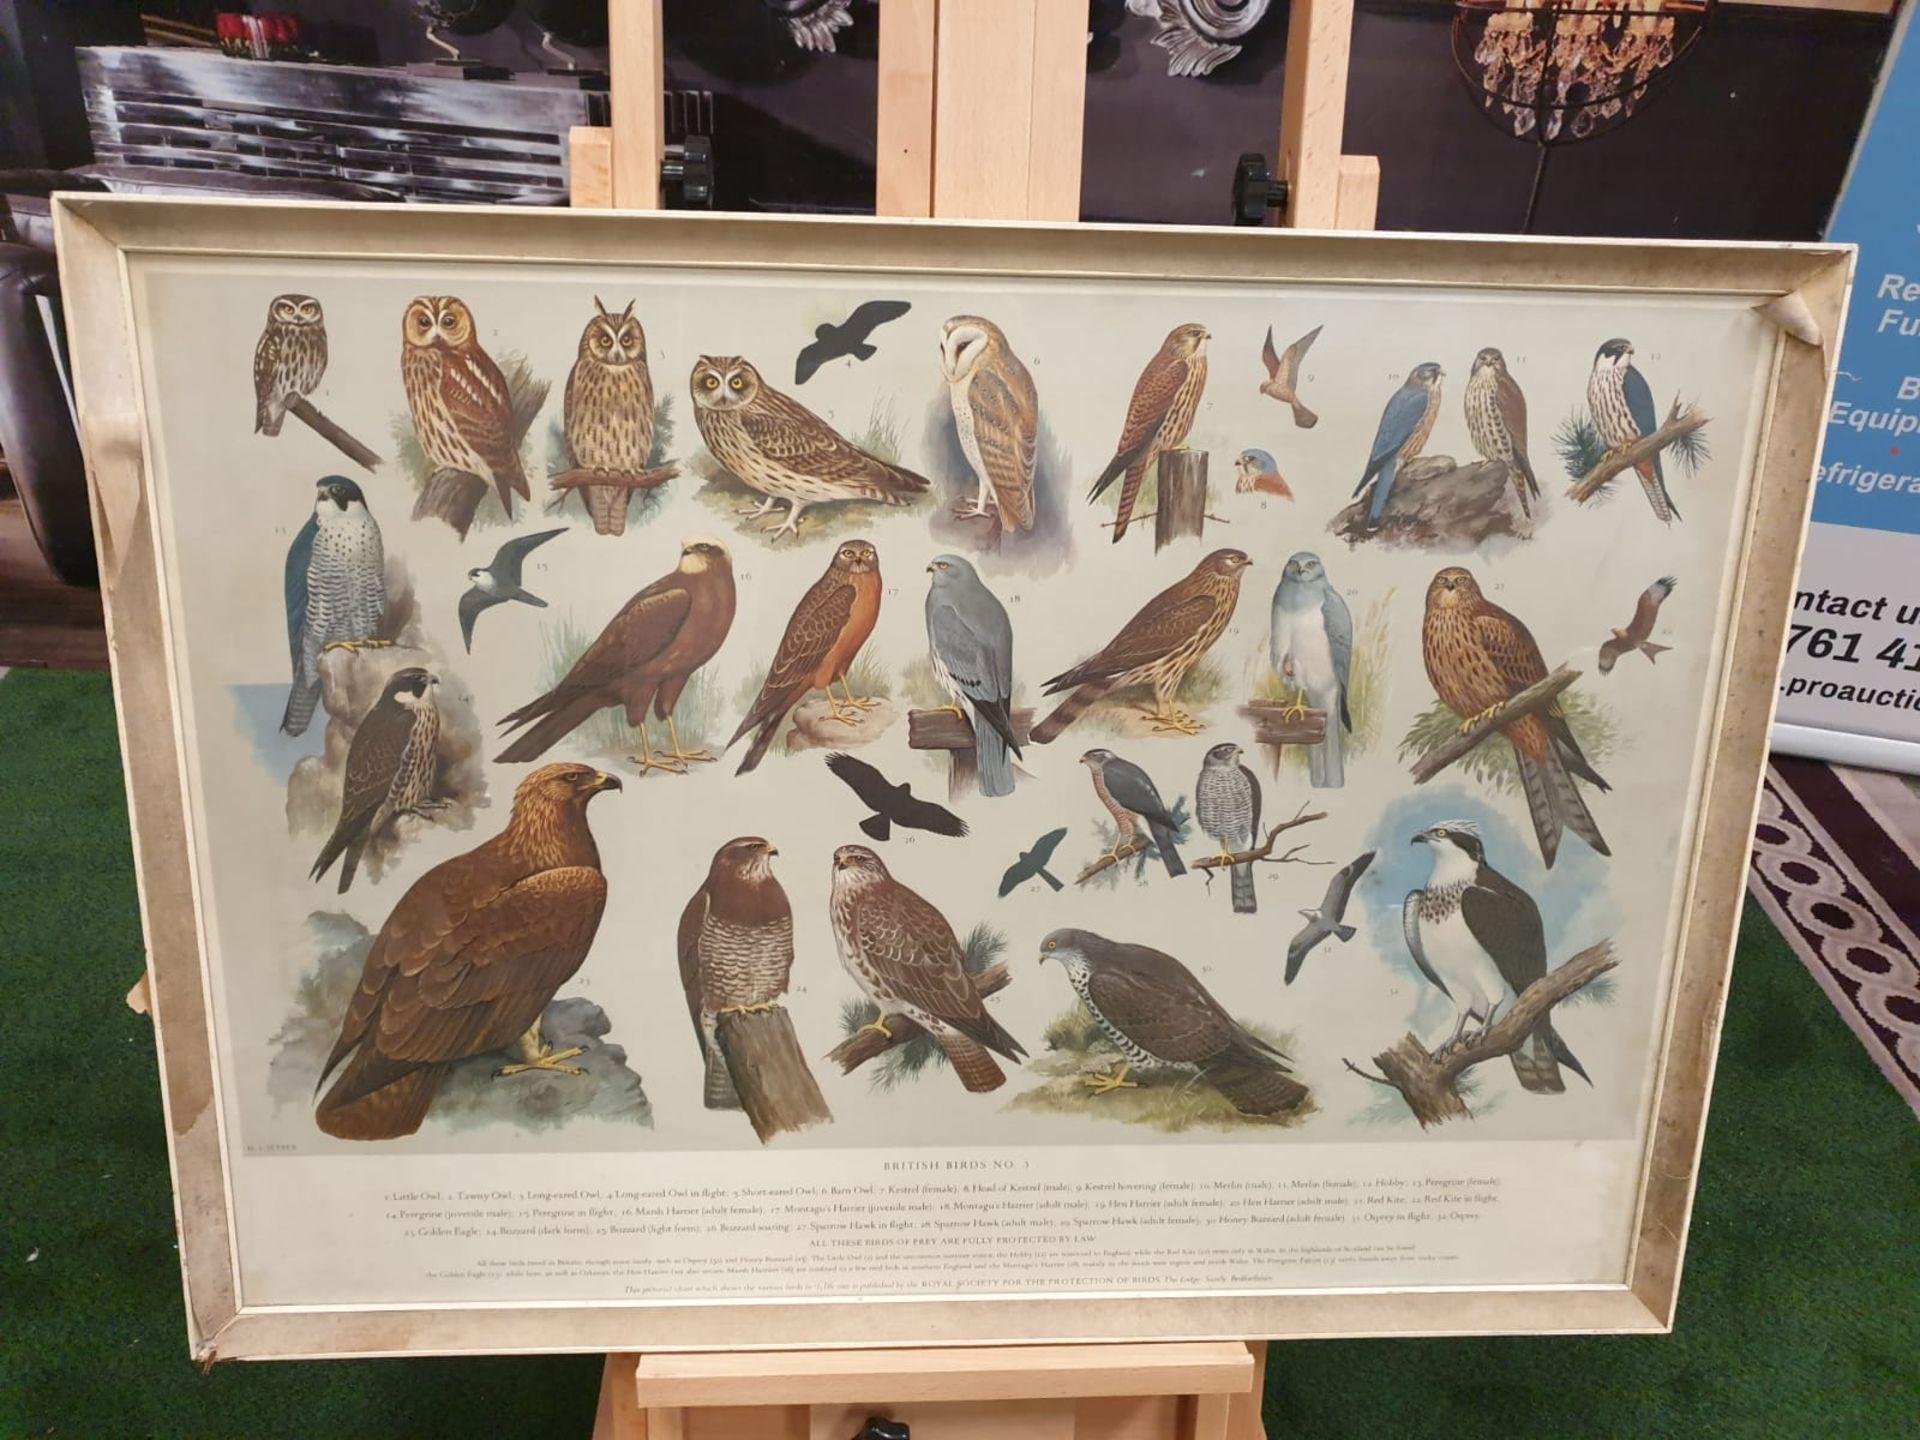 A set of 5 framed series 1 – 5 coloured prints pictorial charts RSPB on British Birds H J Slyper - Image 4 of 7